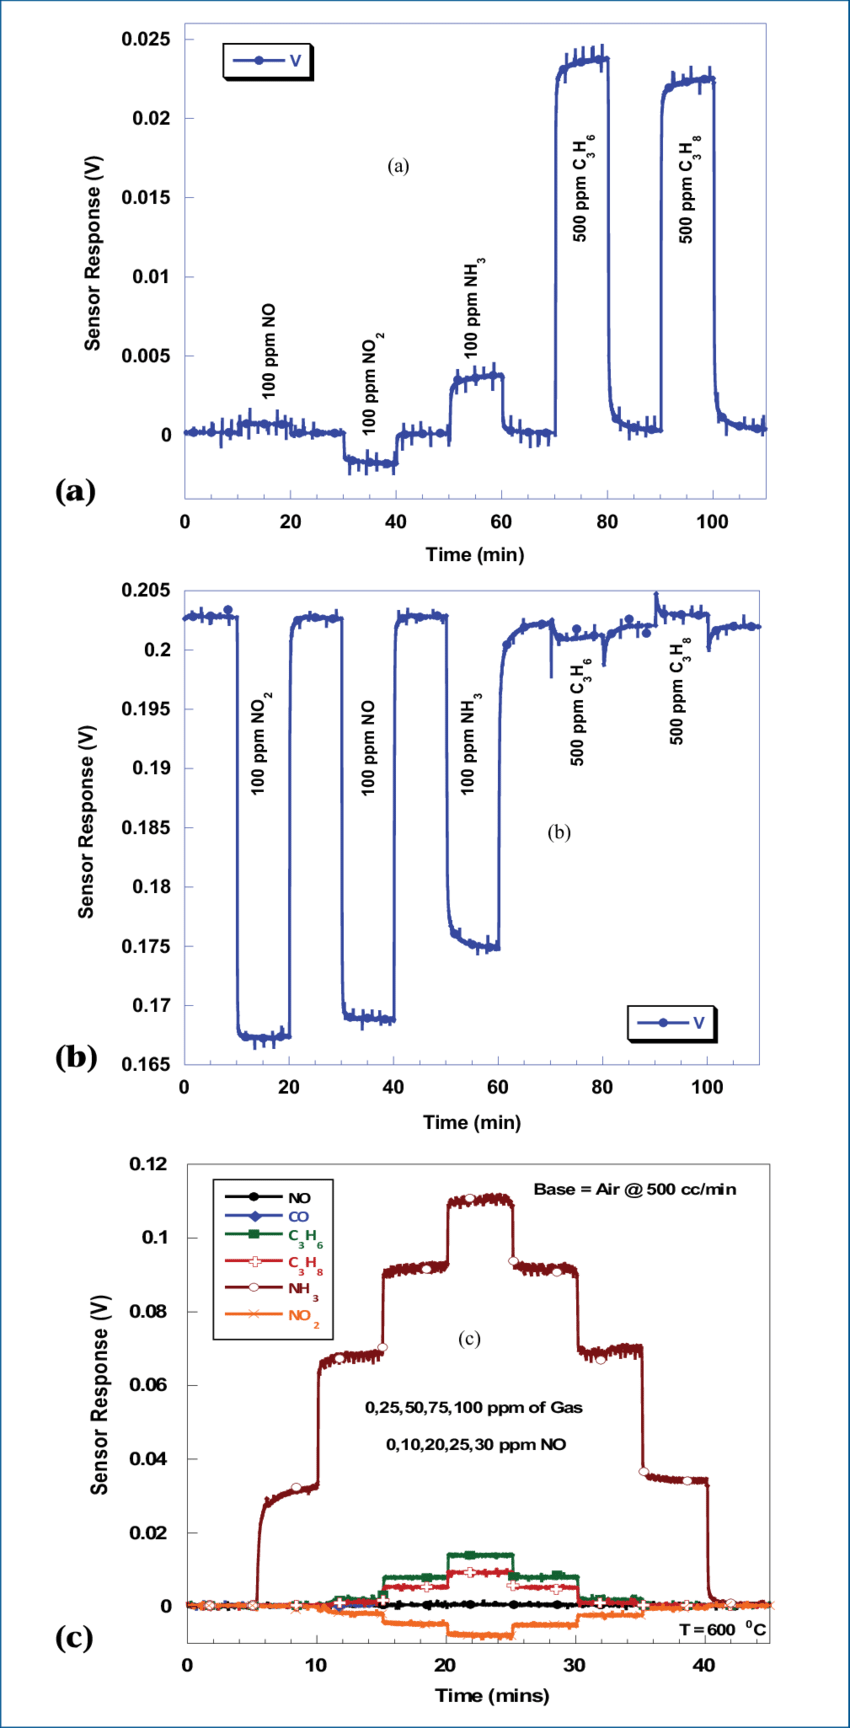 medium resolution of sensor configuration la 0 8 sr 0 2 cro 3 ysz pt open circuit 550 c 200 sccm b sensor configuration la 0 8 sr 0 2 cro 3 ysz pt